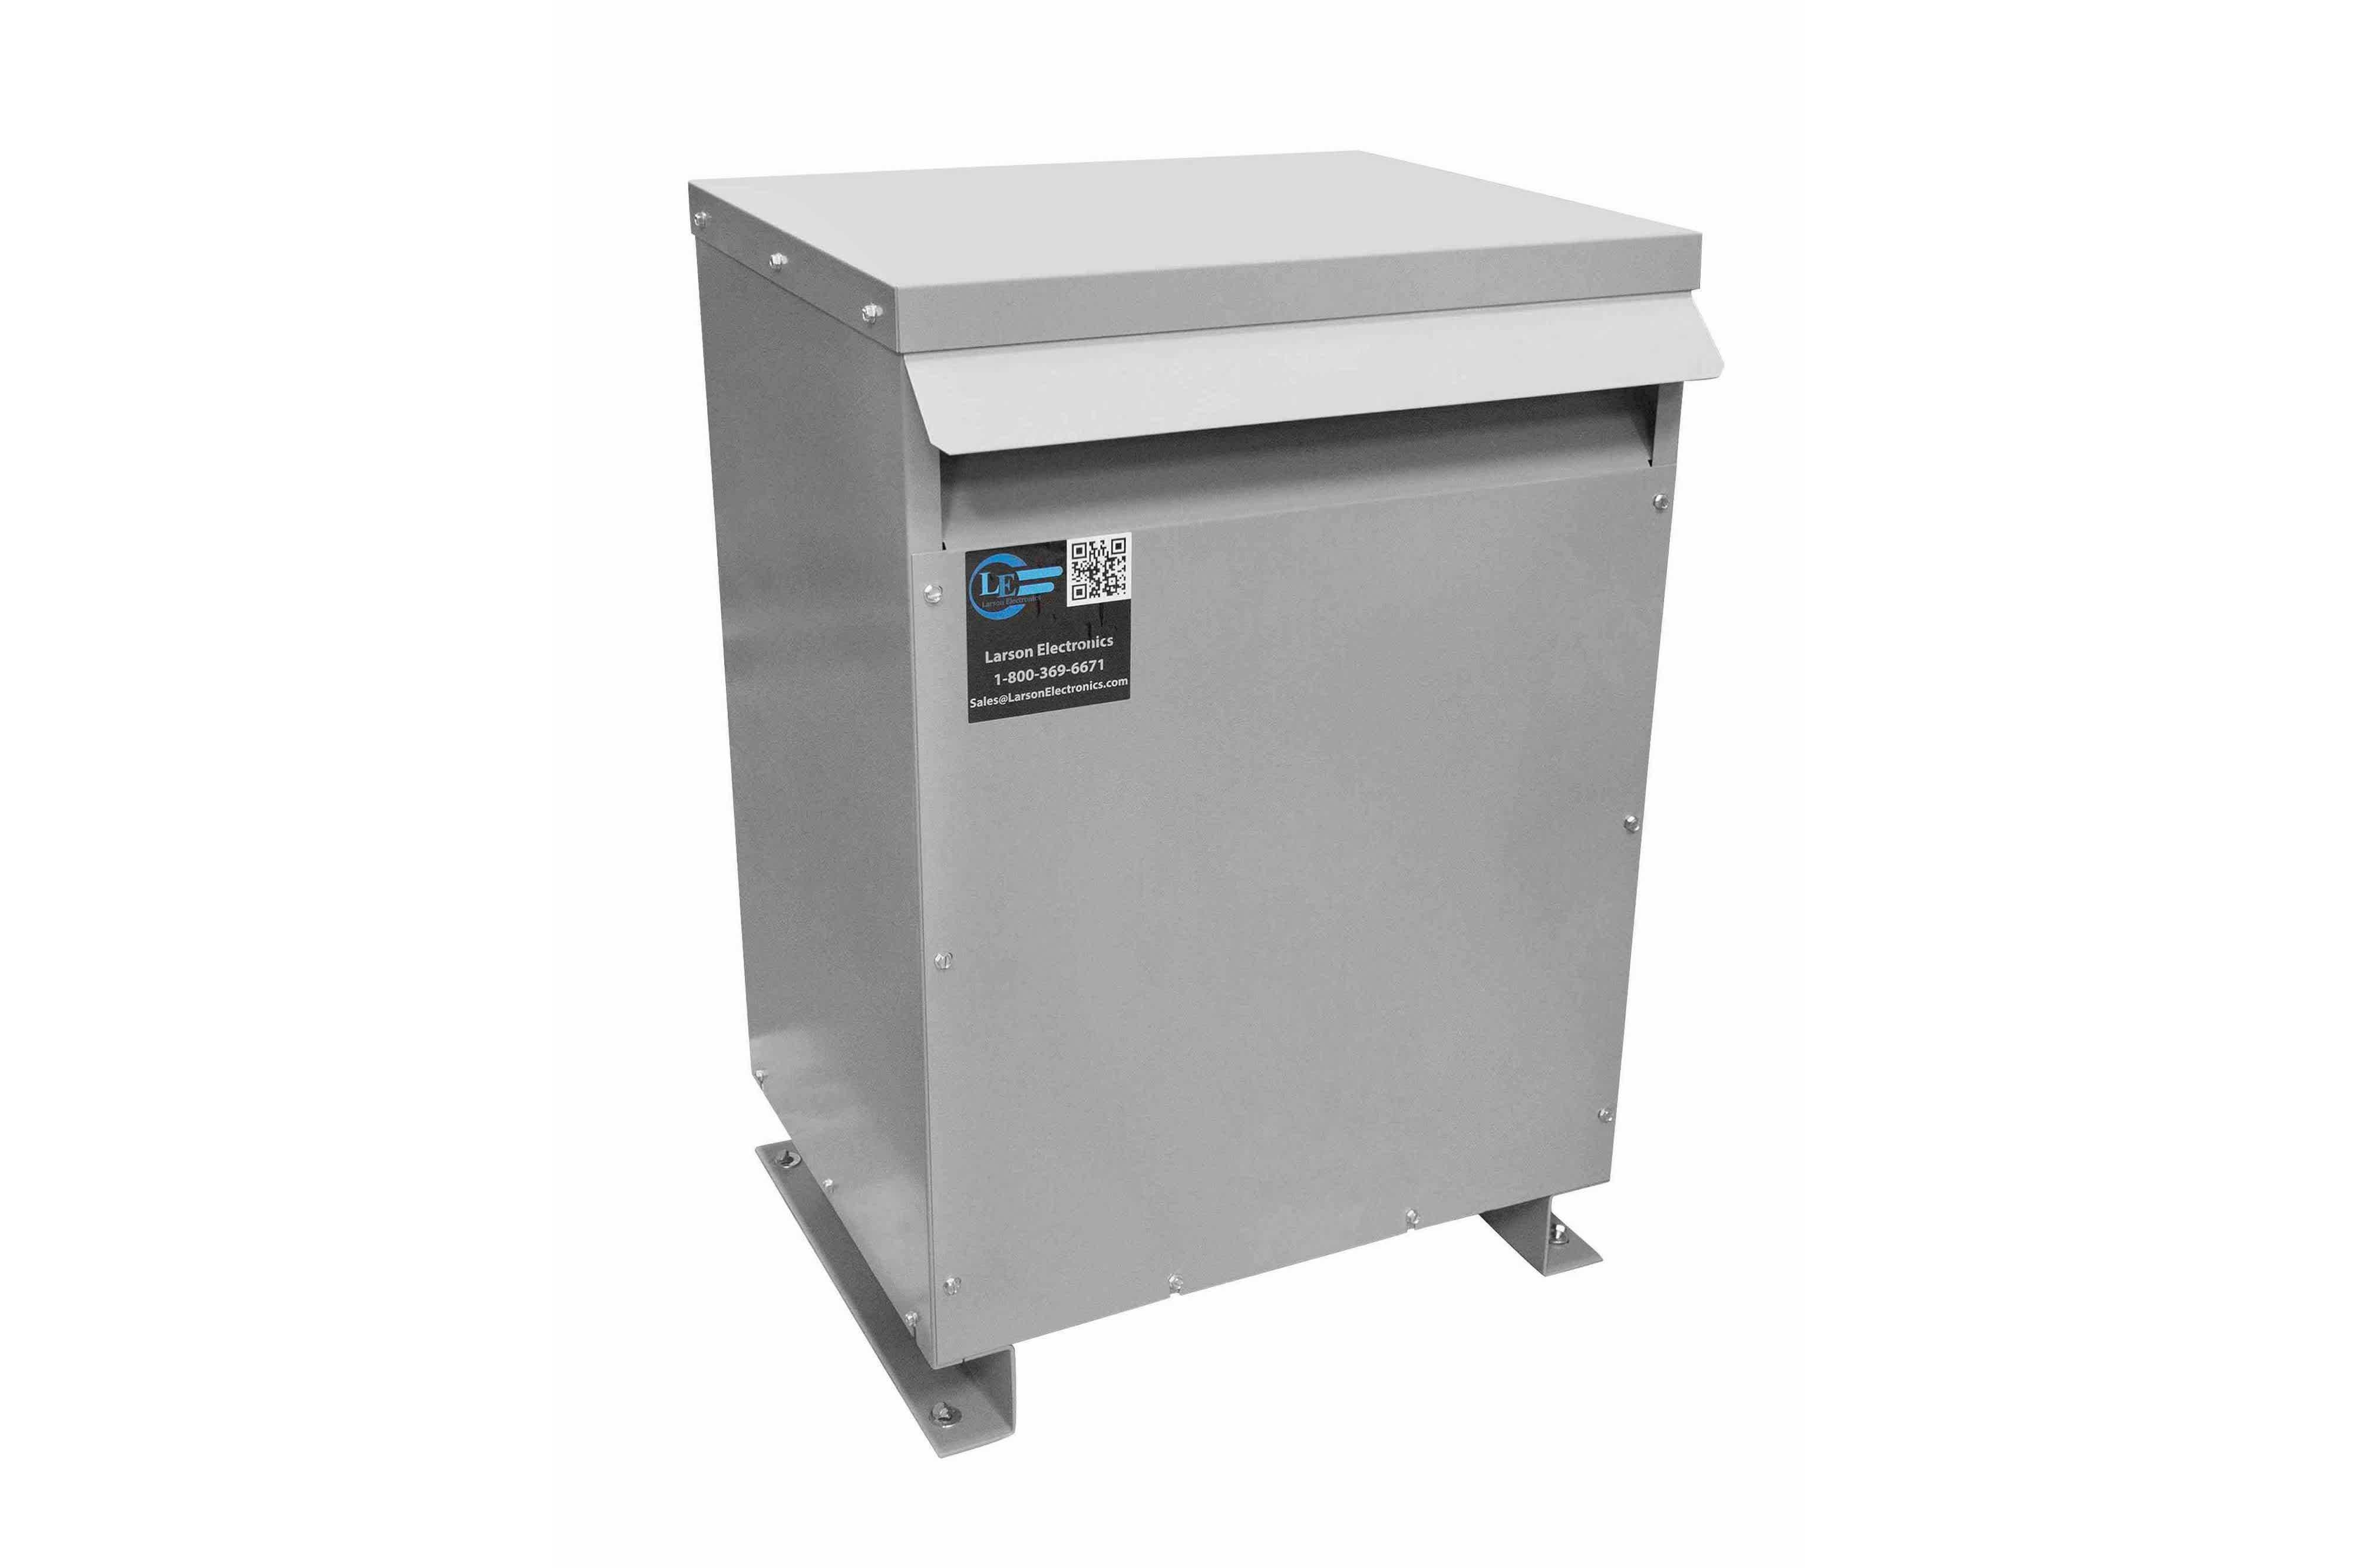 500 kVA 3PH DOE Transformer, 400V Delta Primary, 600Y/347 Wye-N Secondary, N3R, Ventilated, 60 Hz